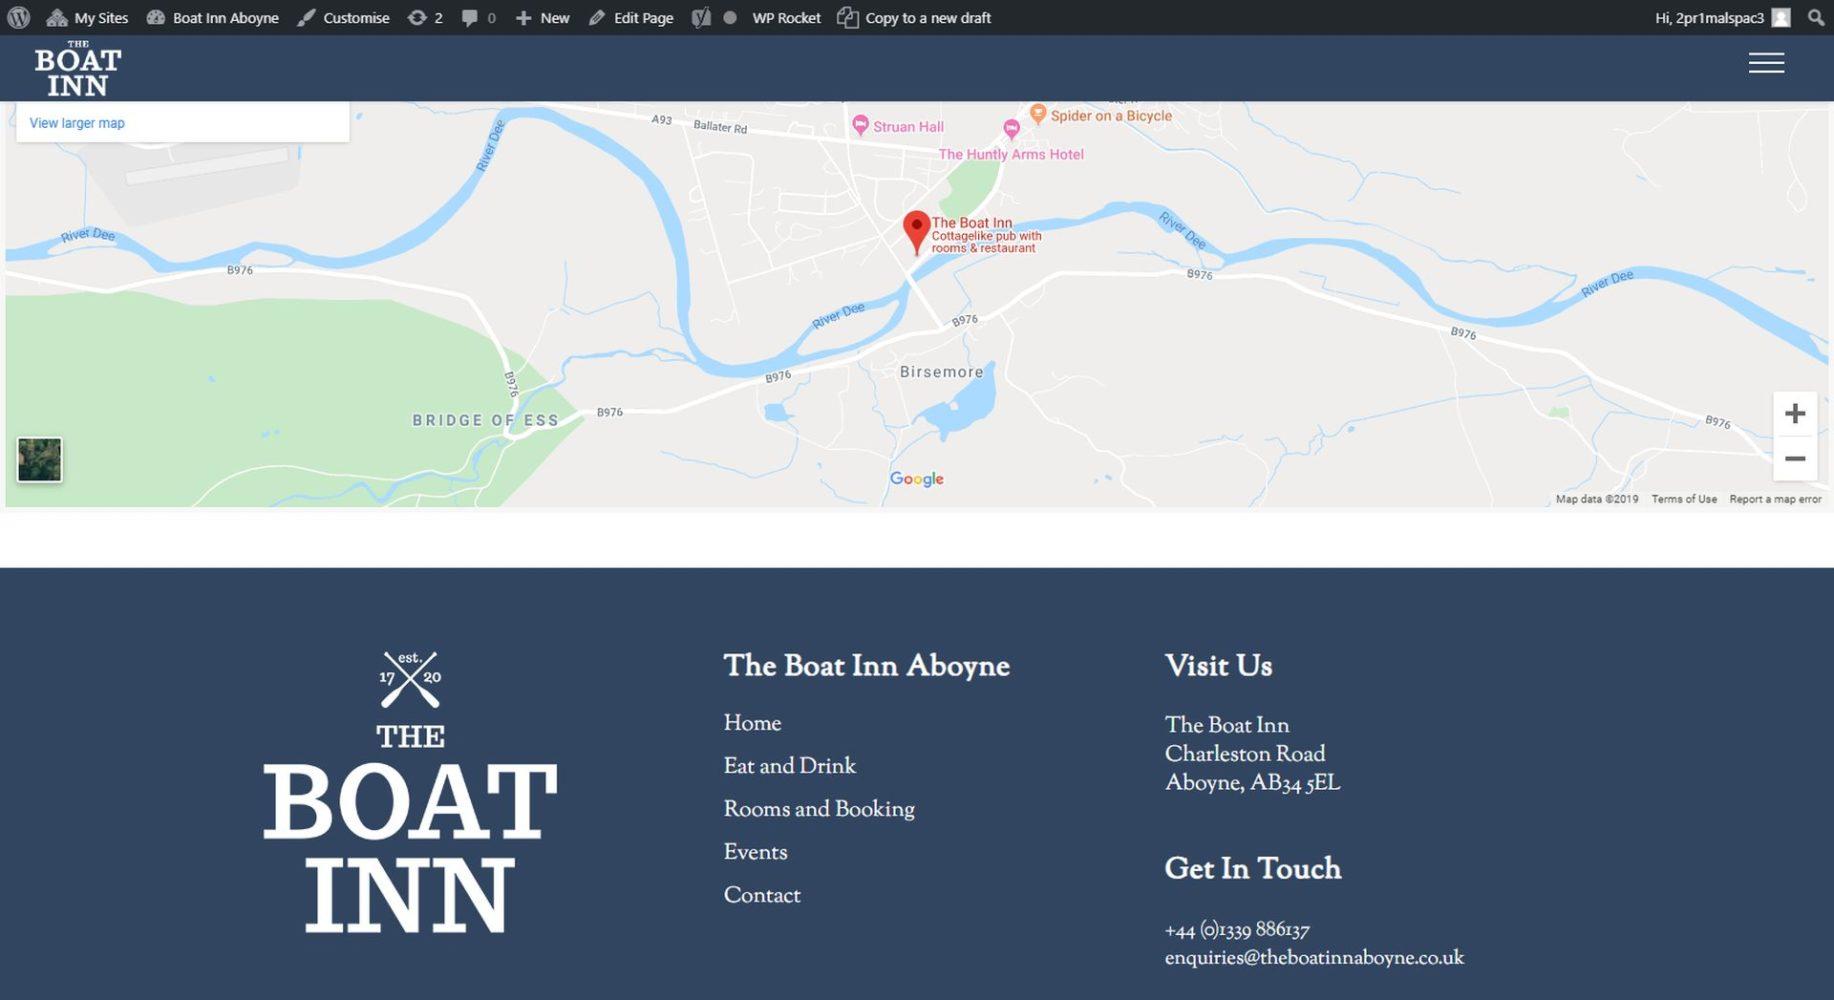 The Boat Inn Aboyne Footer